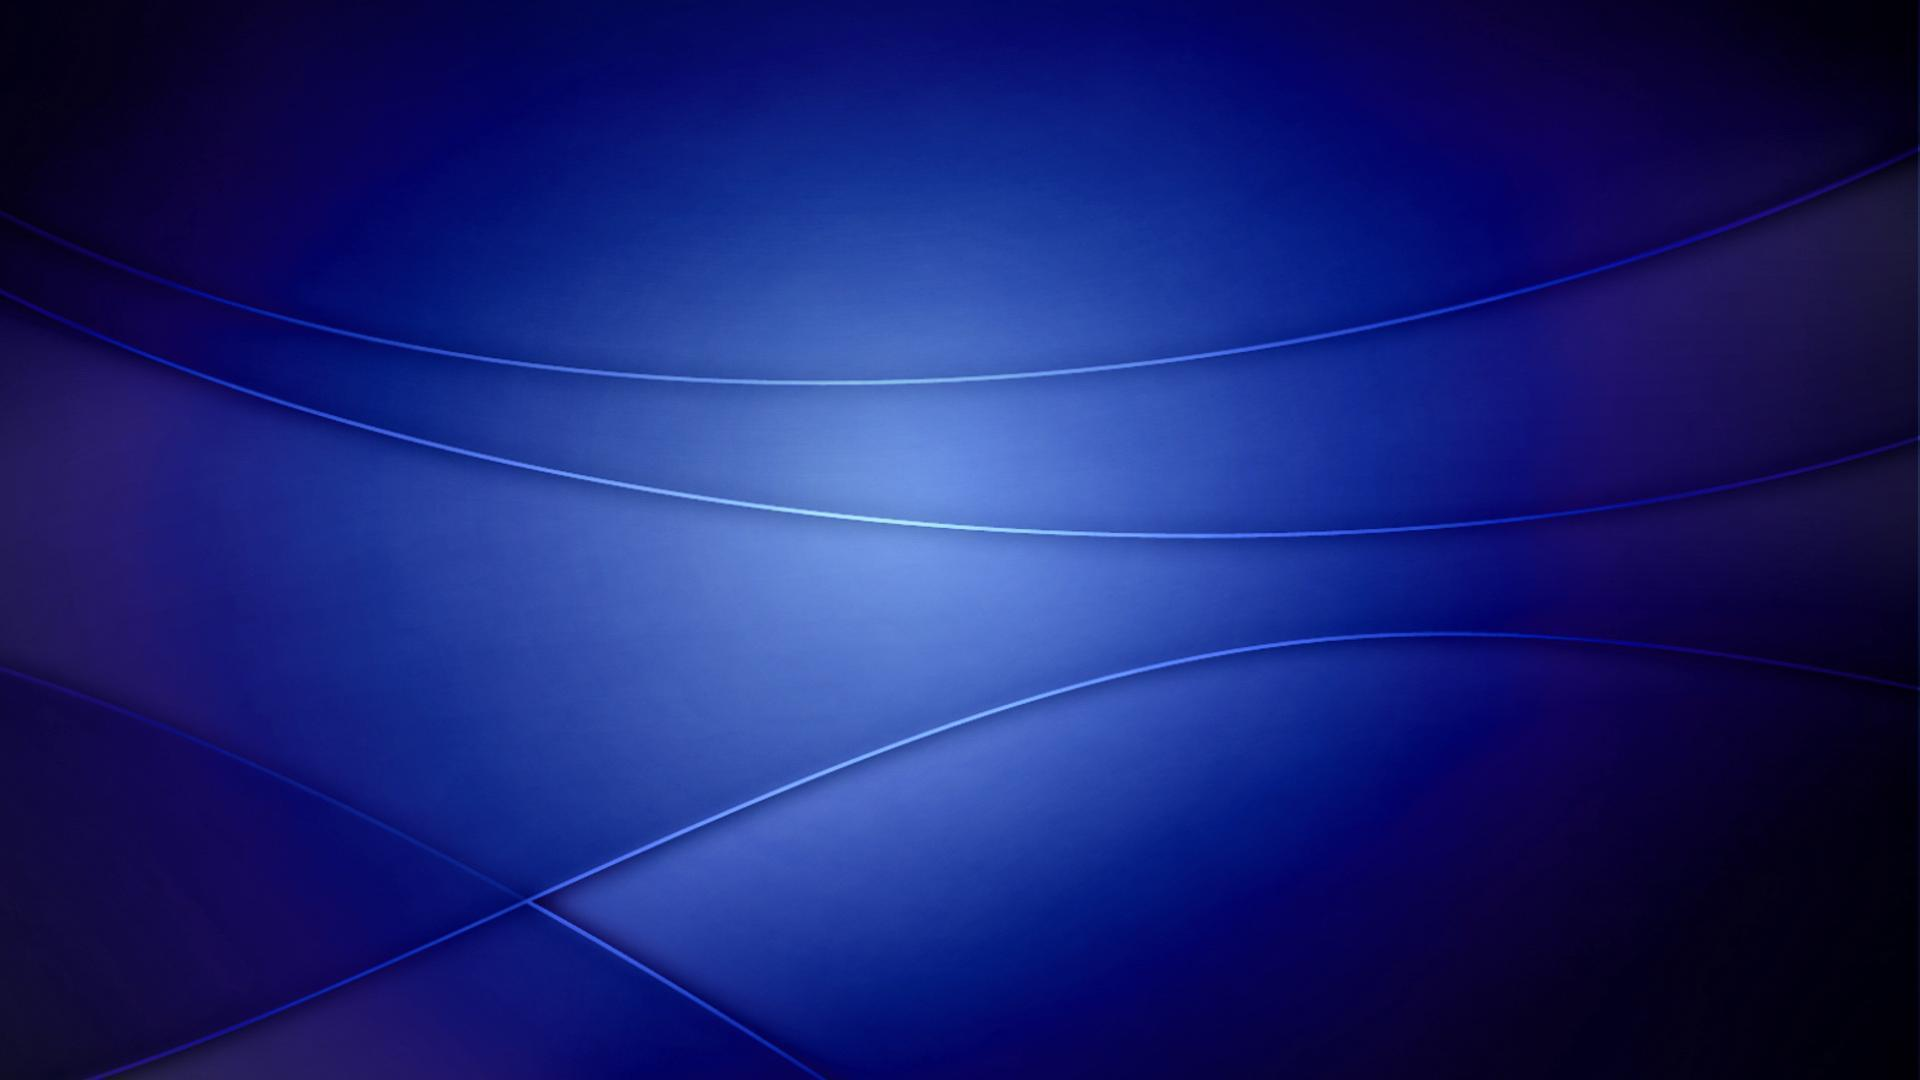 Deep Blue Wallpapers - Wallpaper Cave